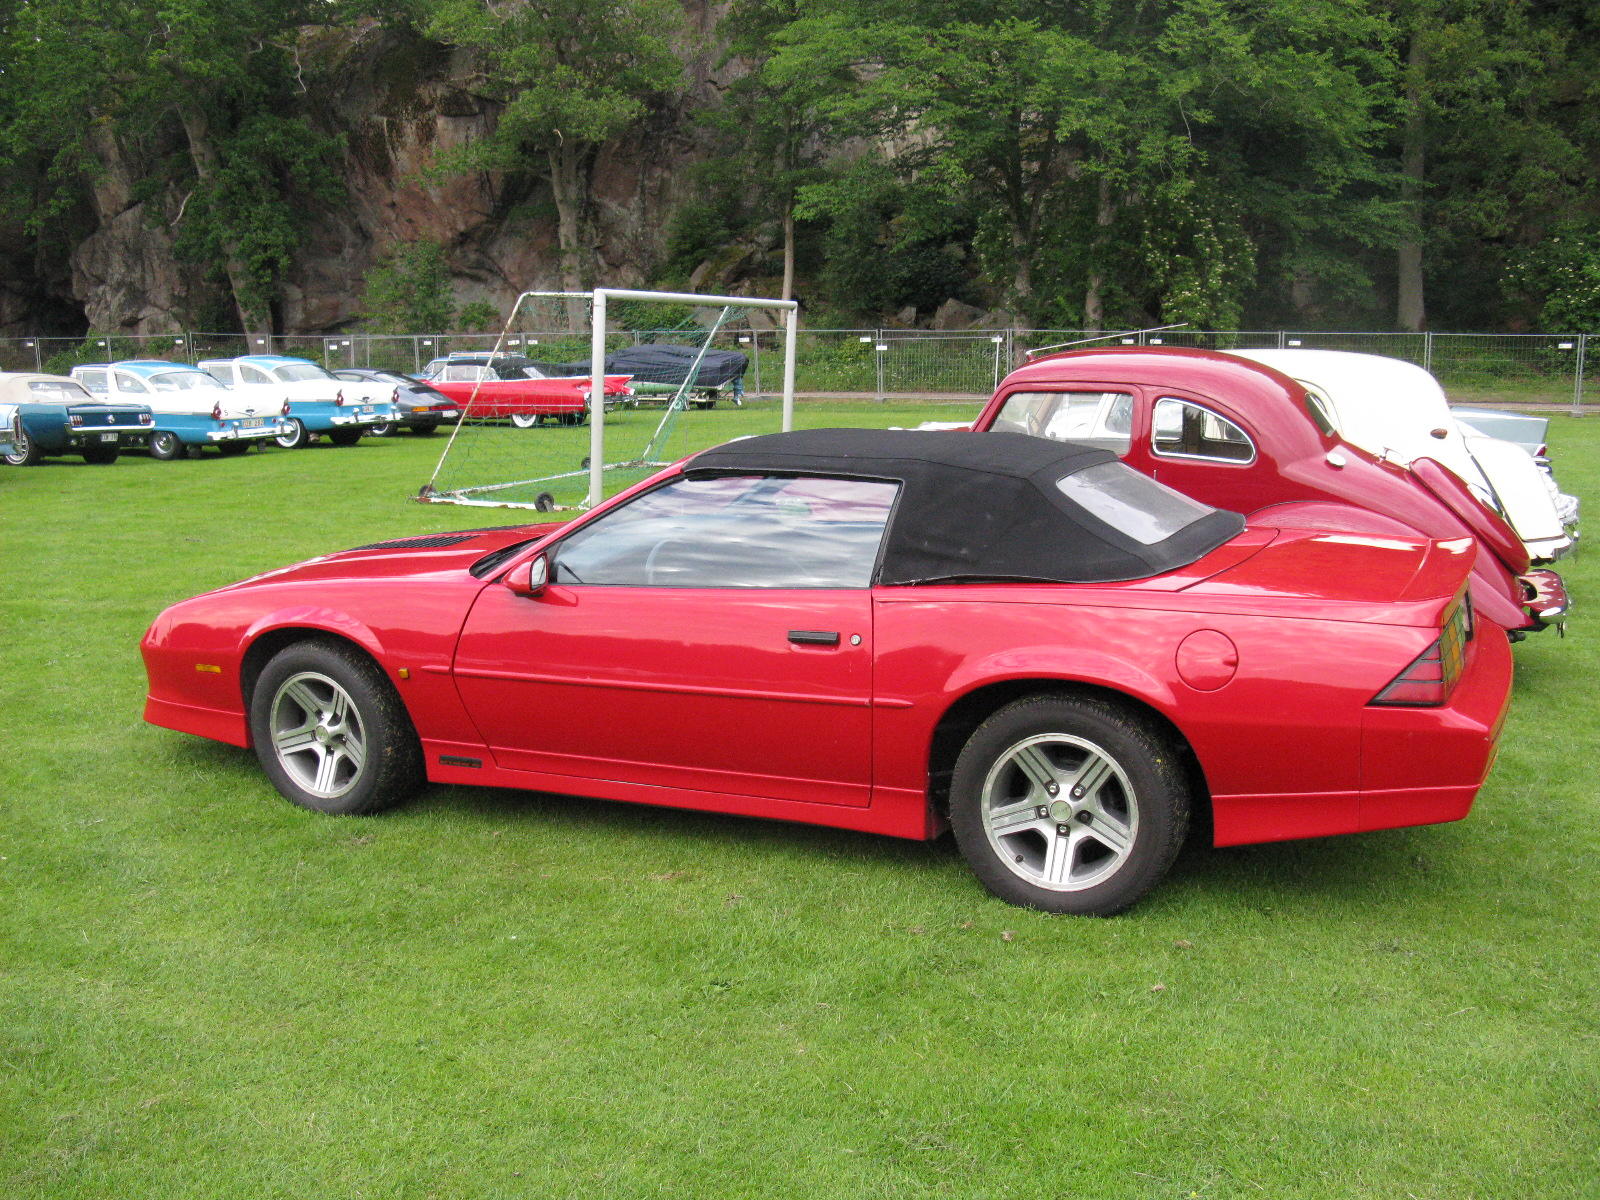 Iroc Z Wiki >> File:Chevrolet Camaro IROC-Z Cabriolet (7509377804).jpg - Wikimedia Commons